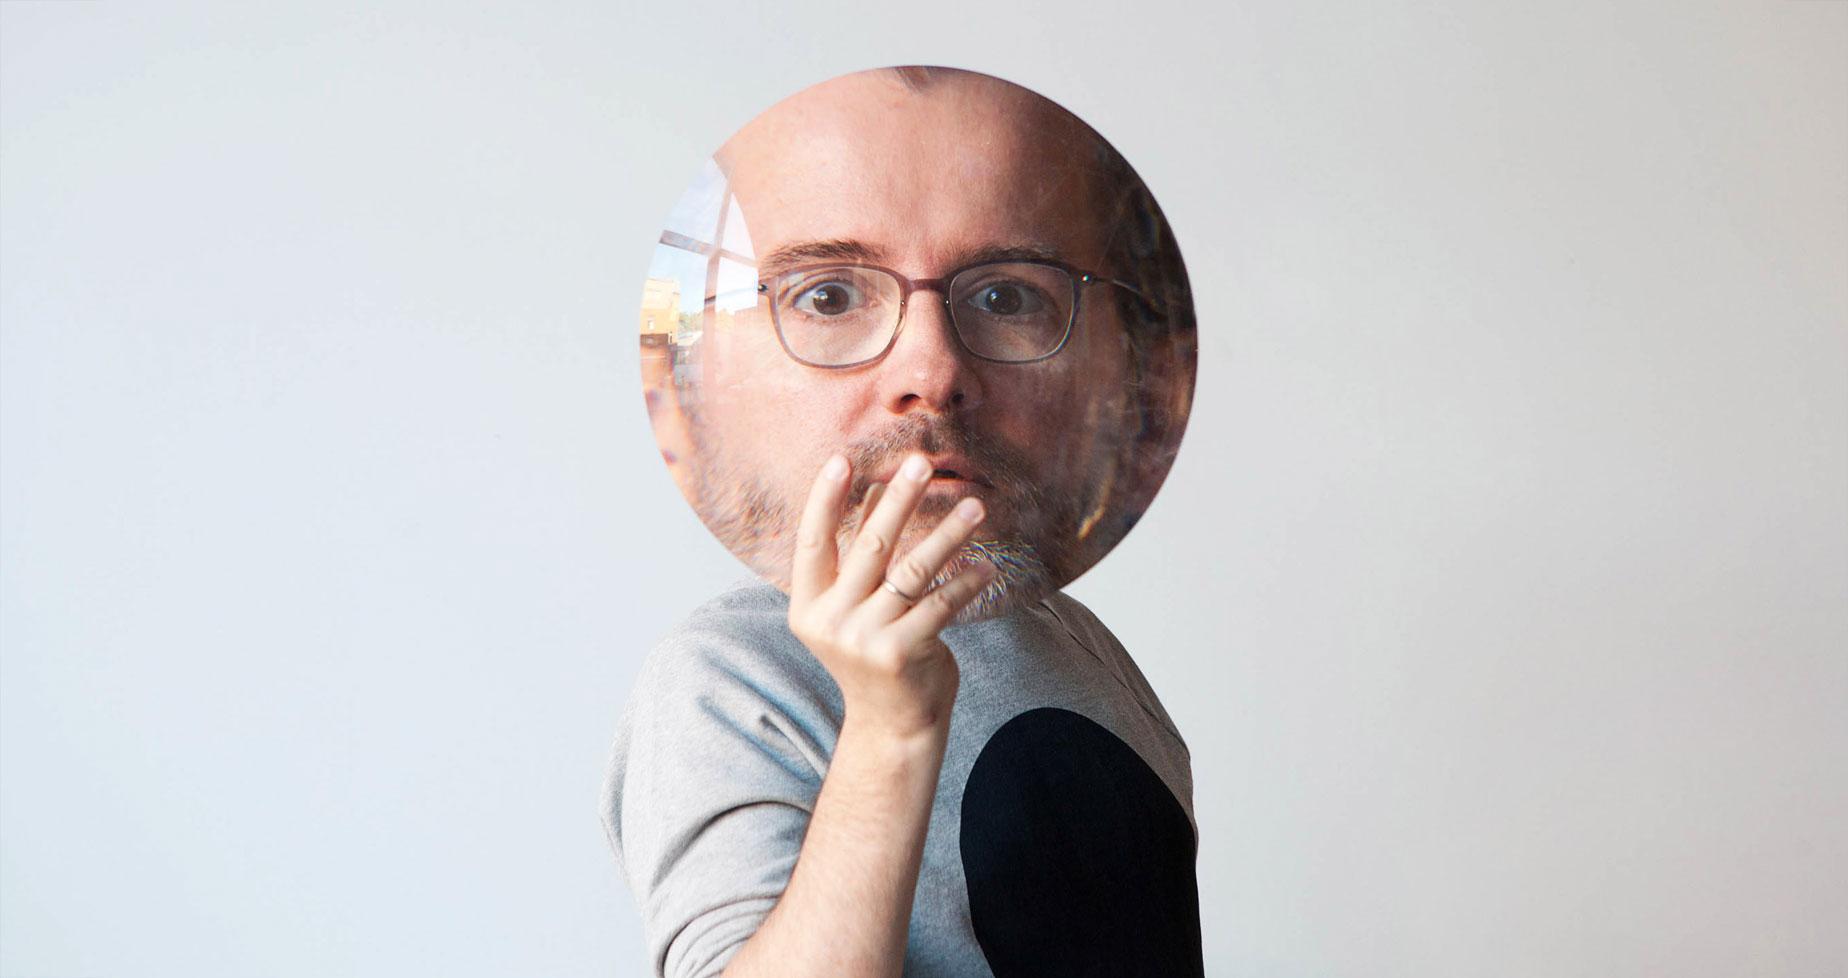 Olafur eliasson portrait